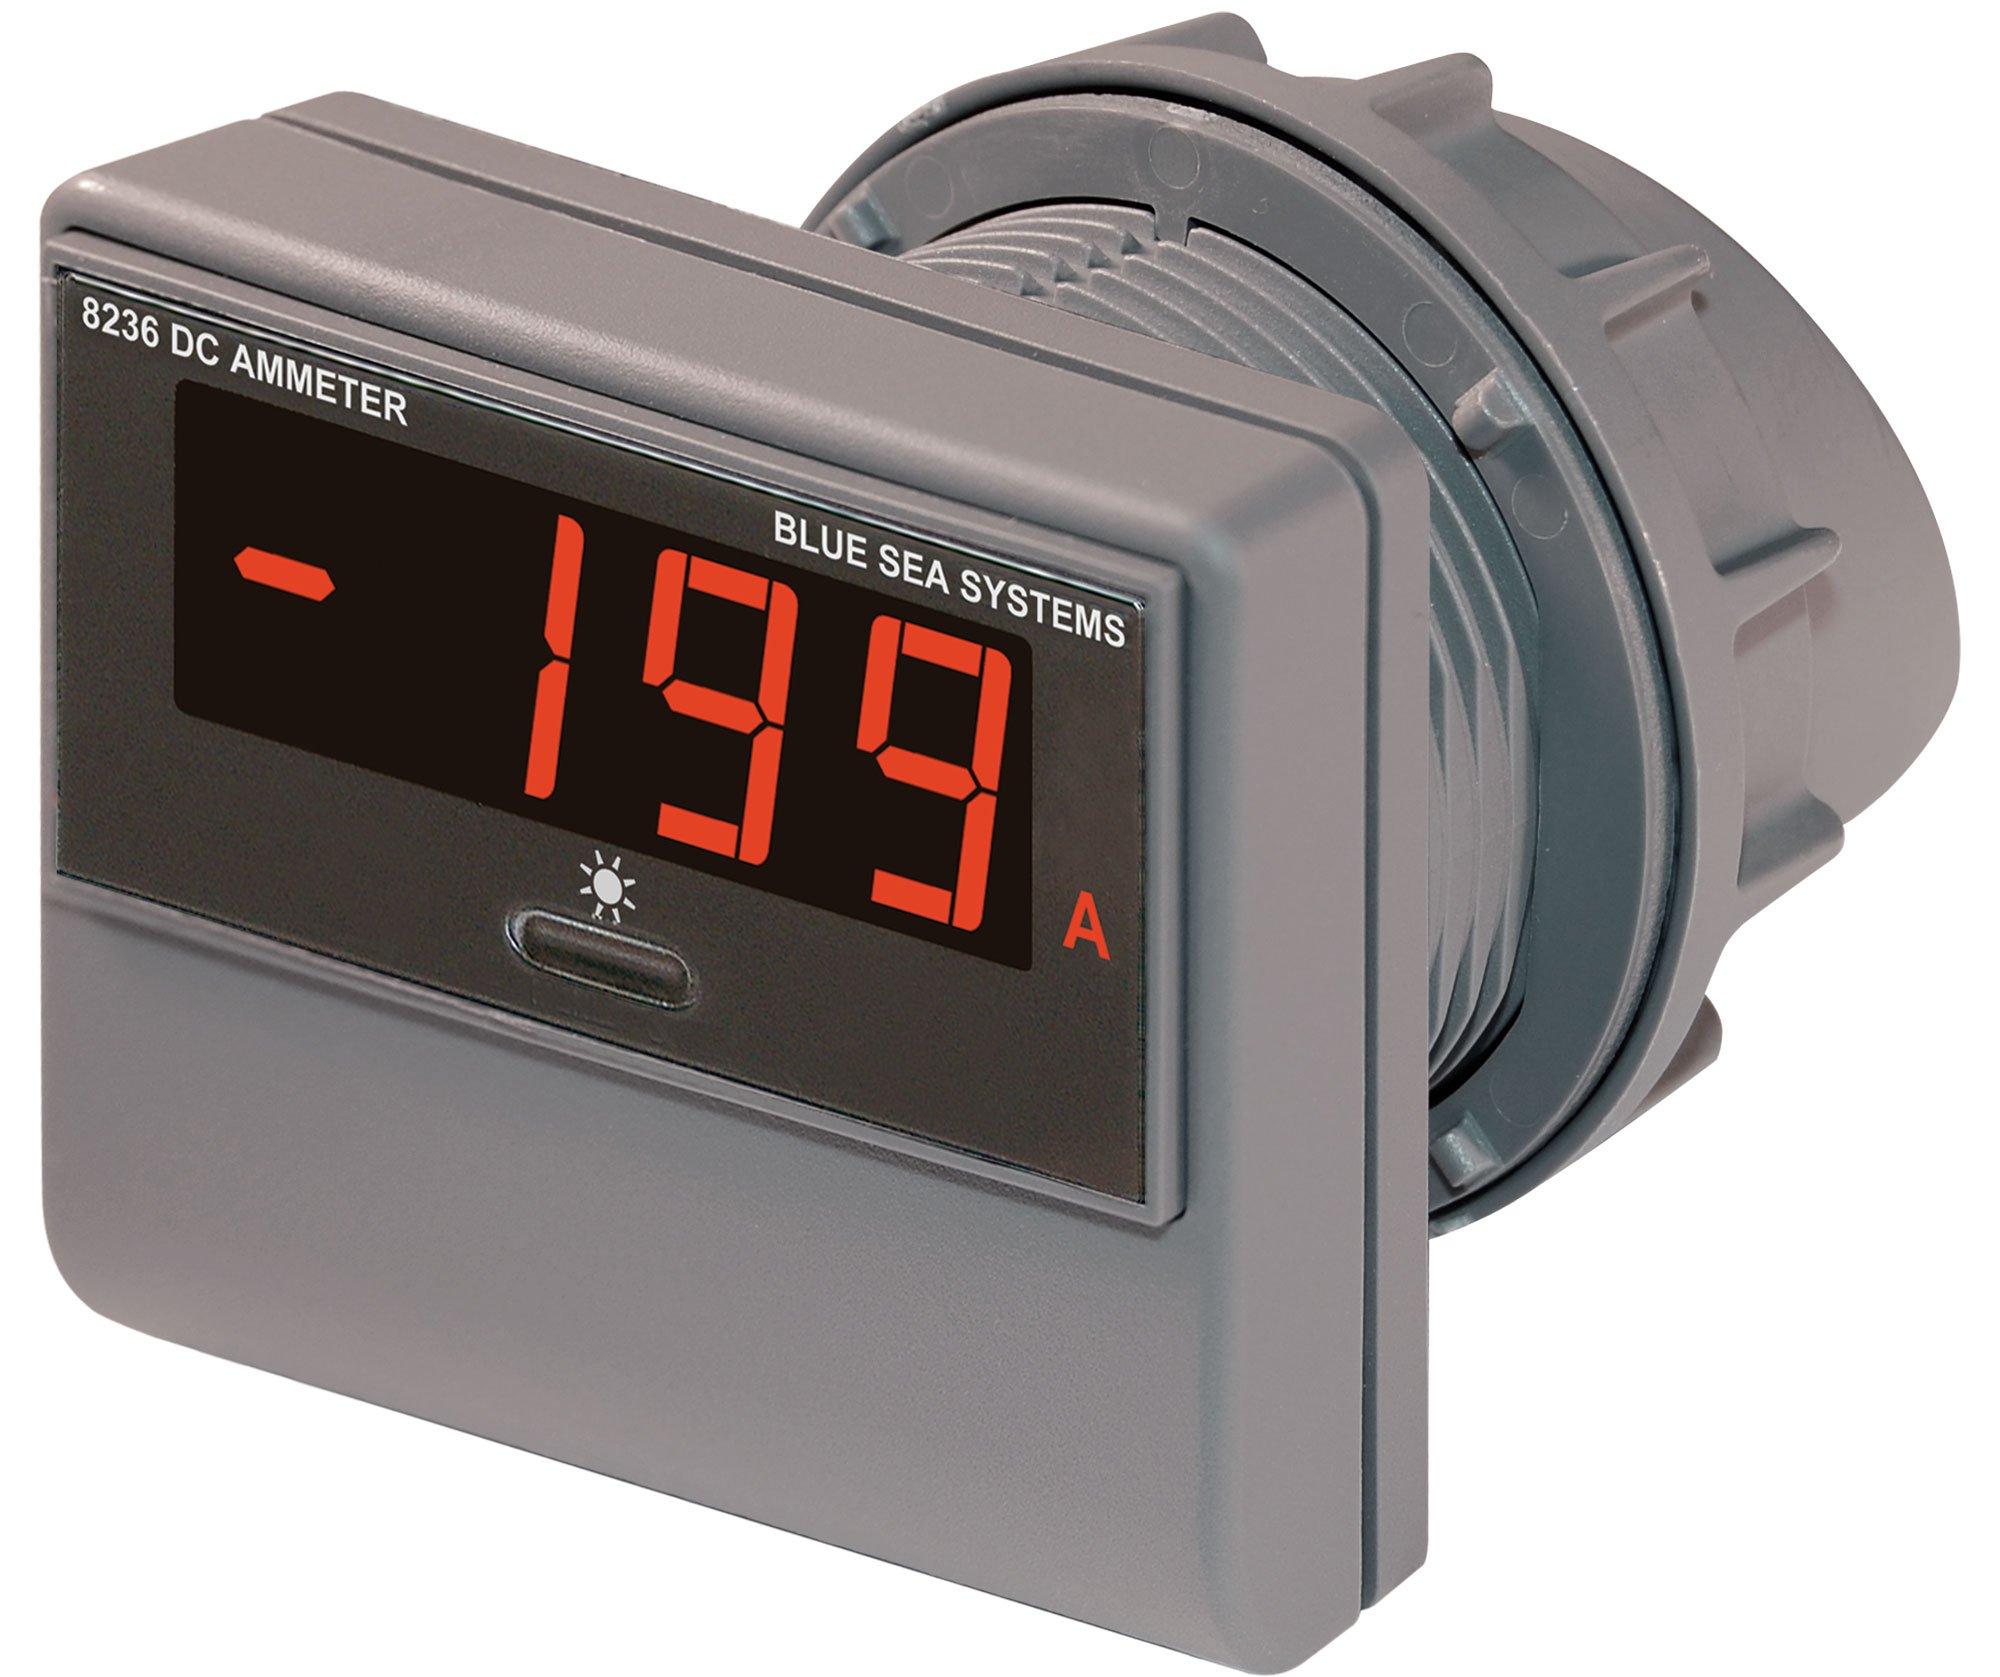 Blue Sea Systems 8236 DC Digital Ammeter